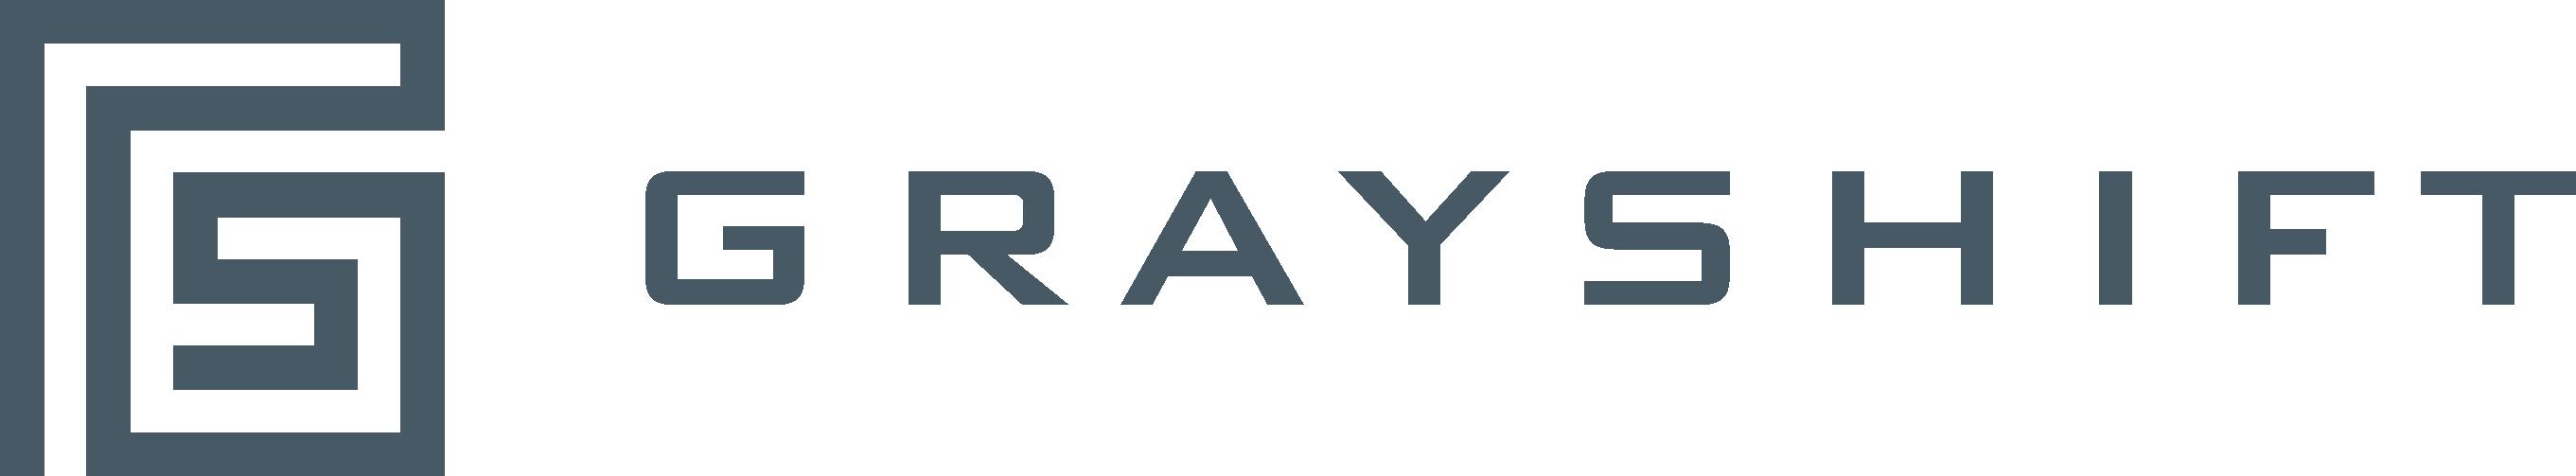 Grayshift_Full_Horizontal_Gray